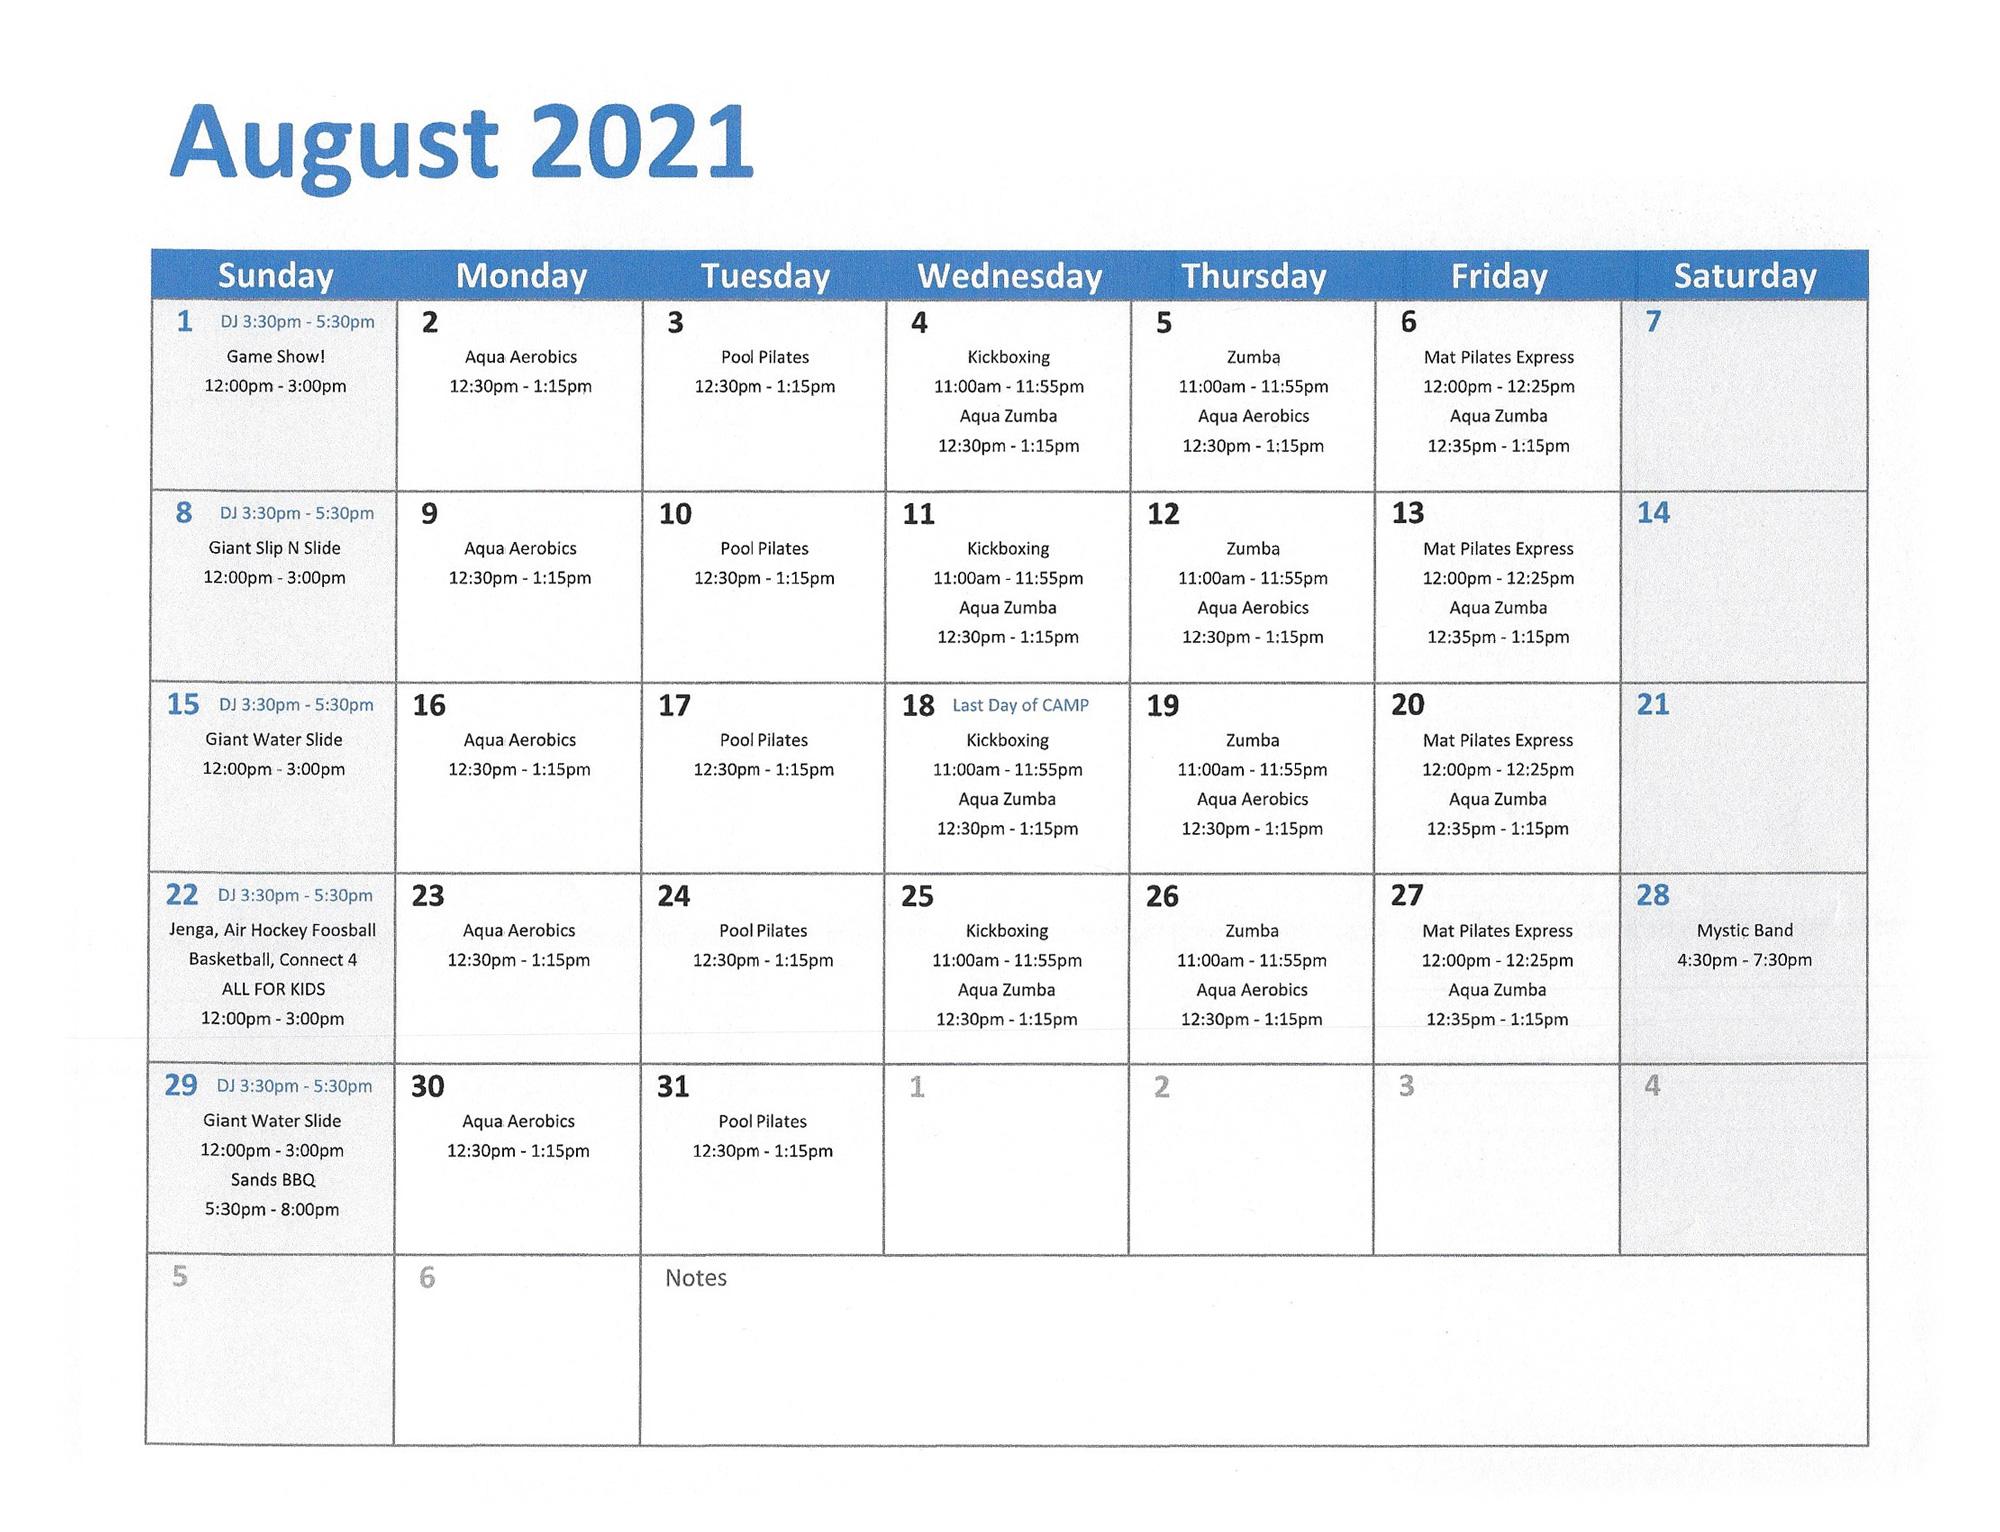 August-21-calendar-of-events